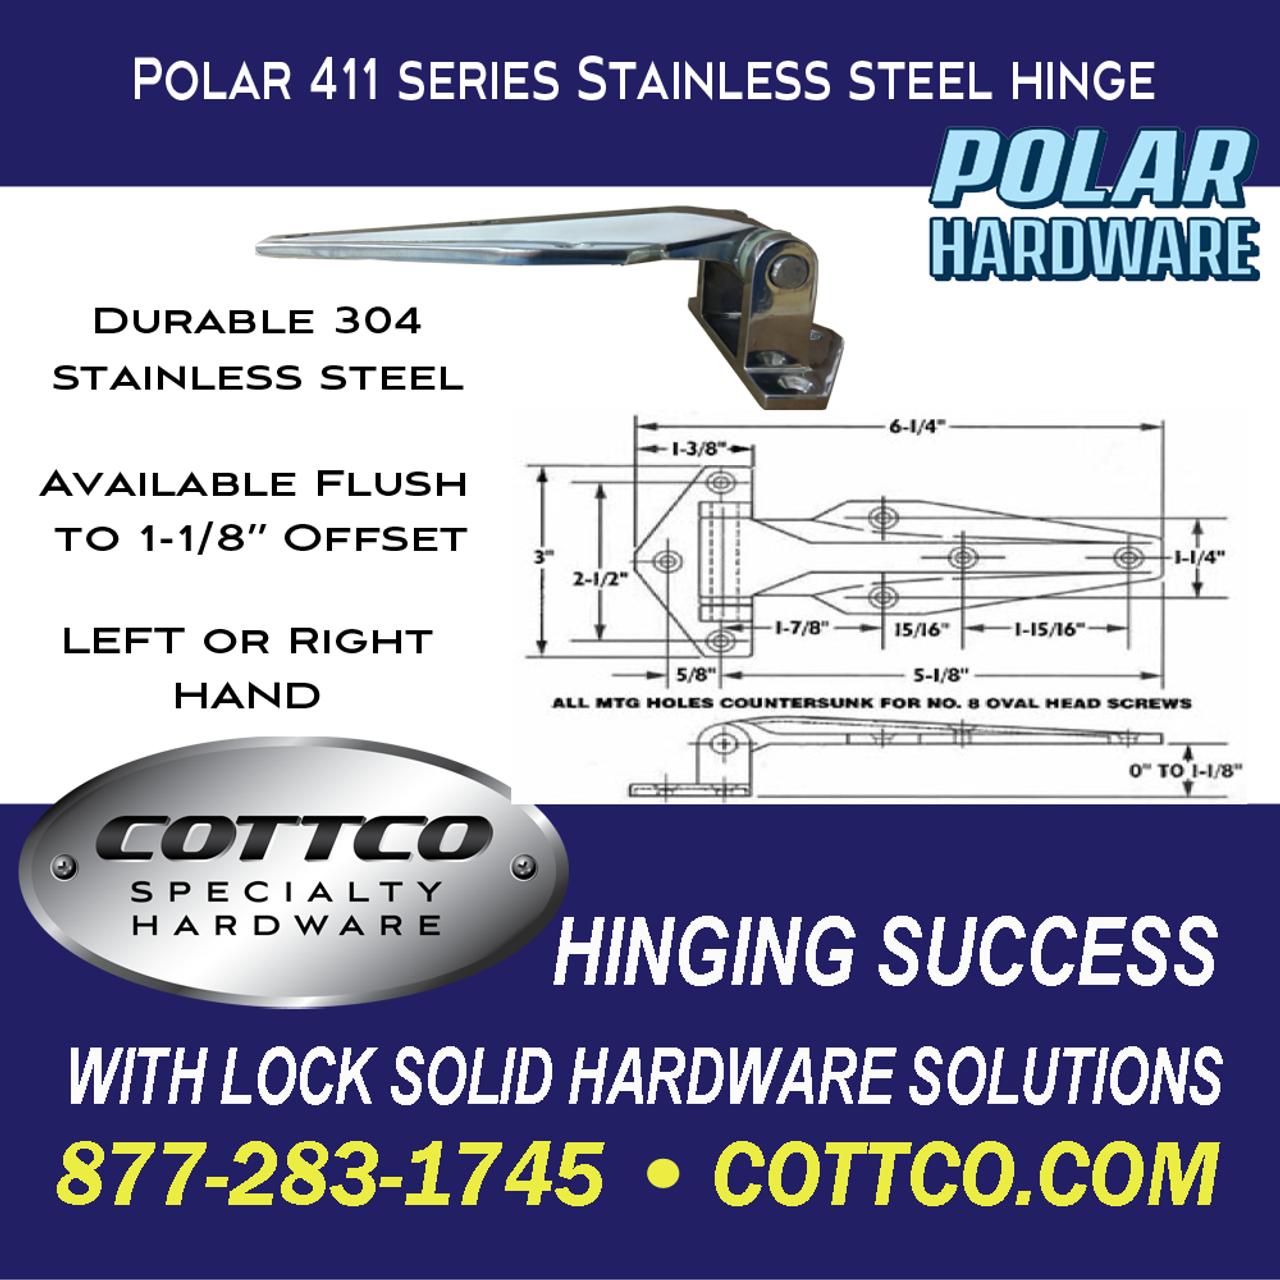 Polar Hardware 411 Flush Refrigeration Hinge